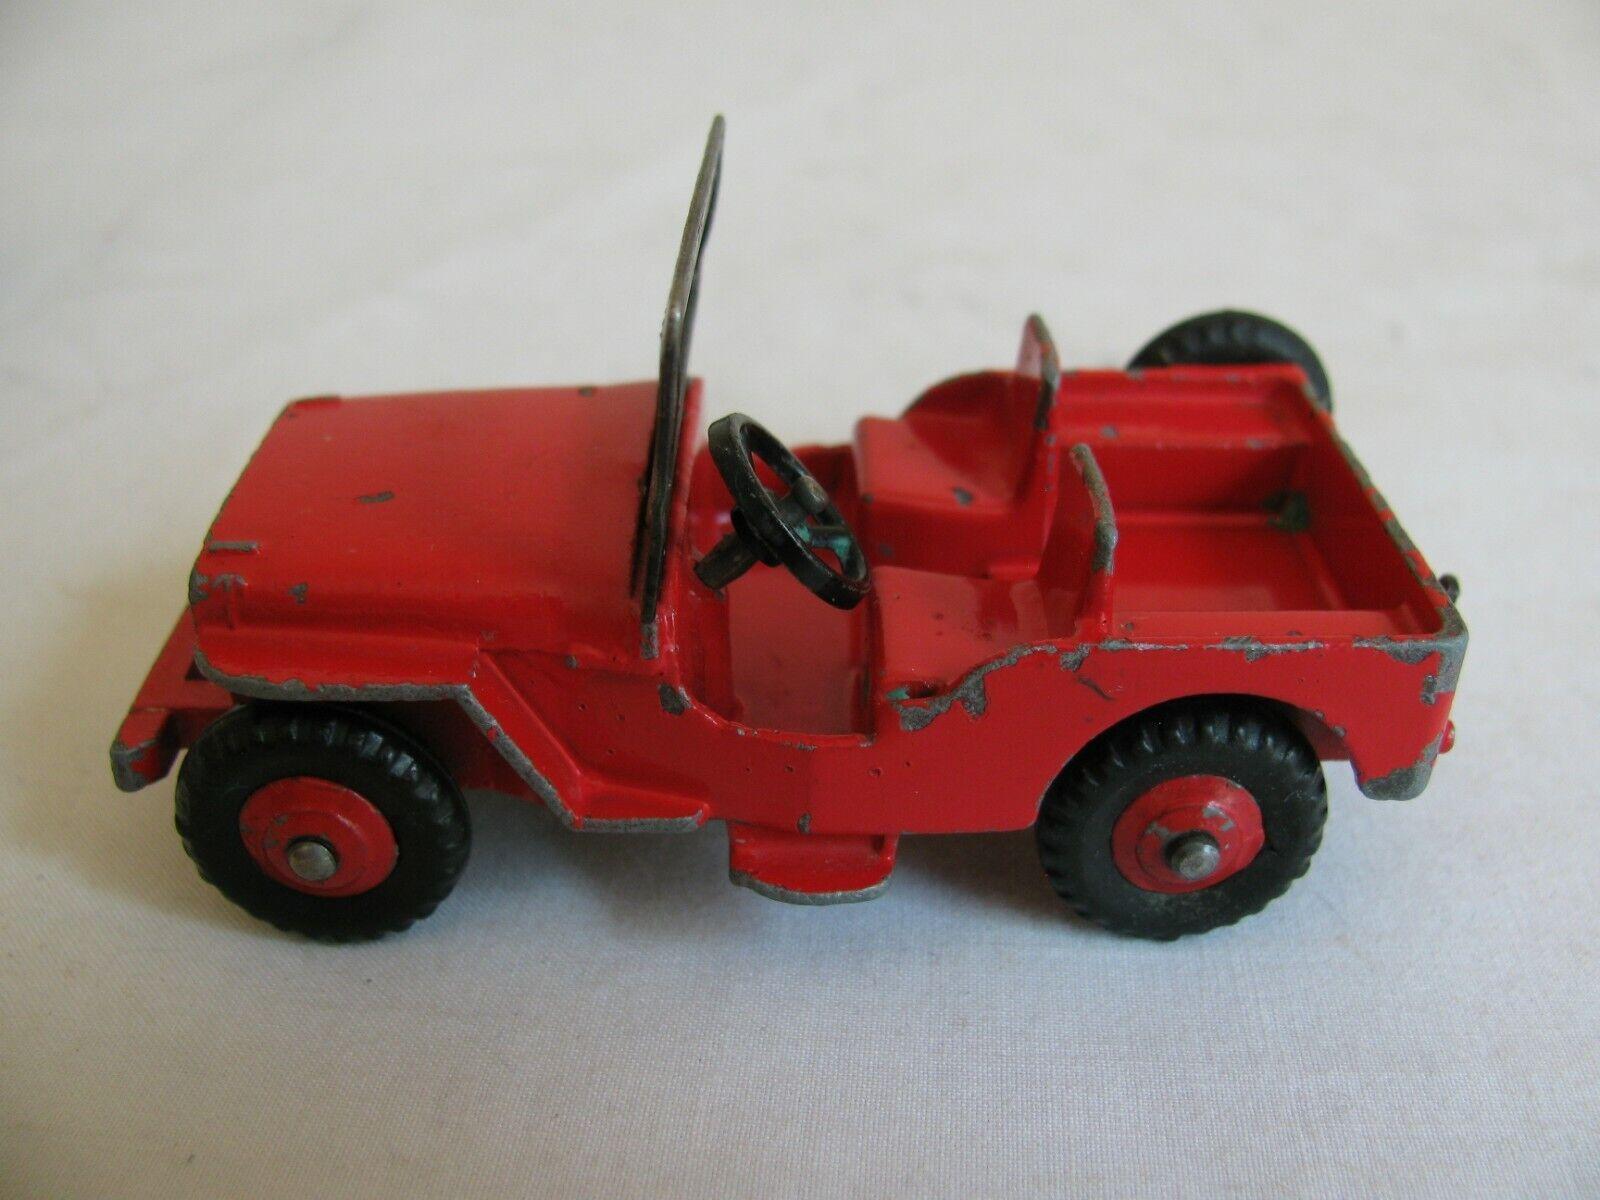 calidad de primera clase Vintage Dinky Juguetes Meccano Jeep Willys Universal civil civil civil roja limitada  405 Muy Buen  compras online de deportes